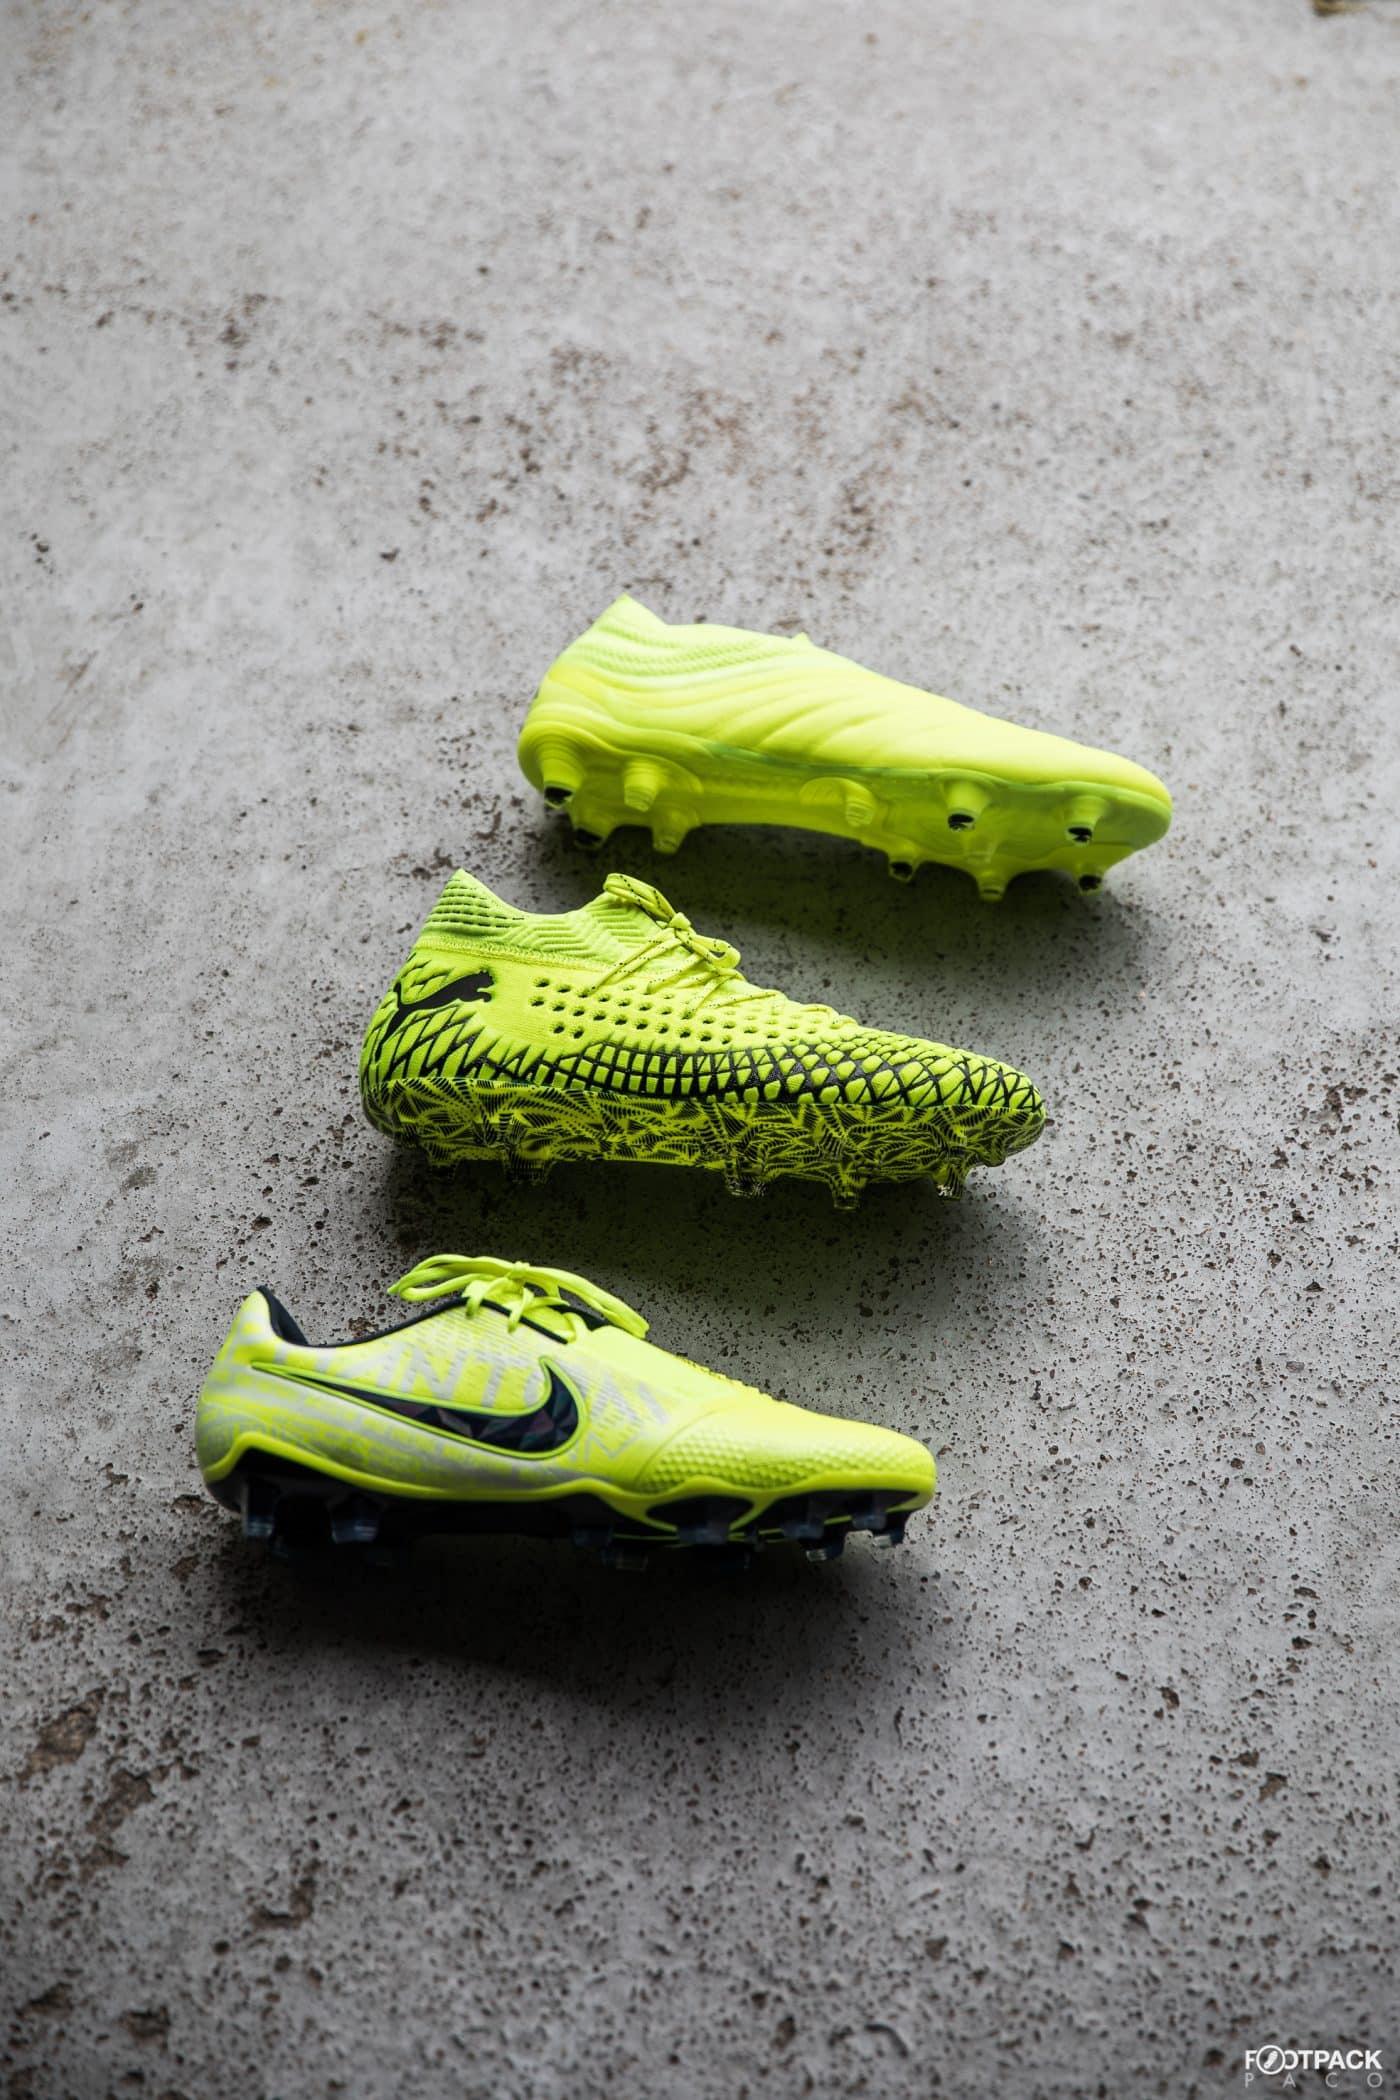 chaussure-jaune-fluo-football